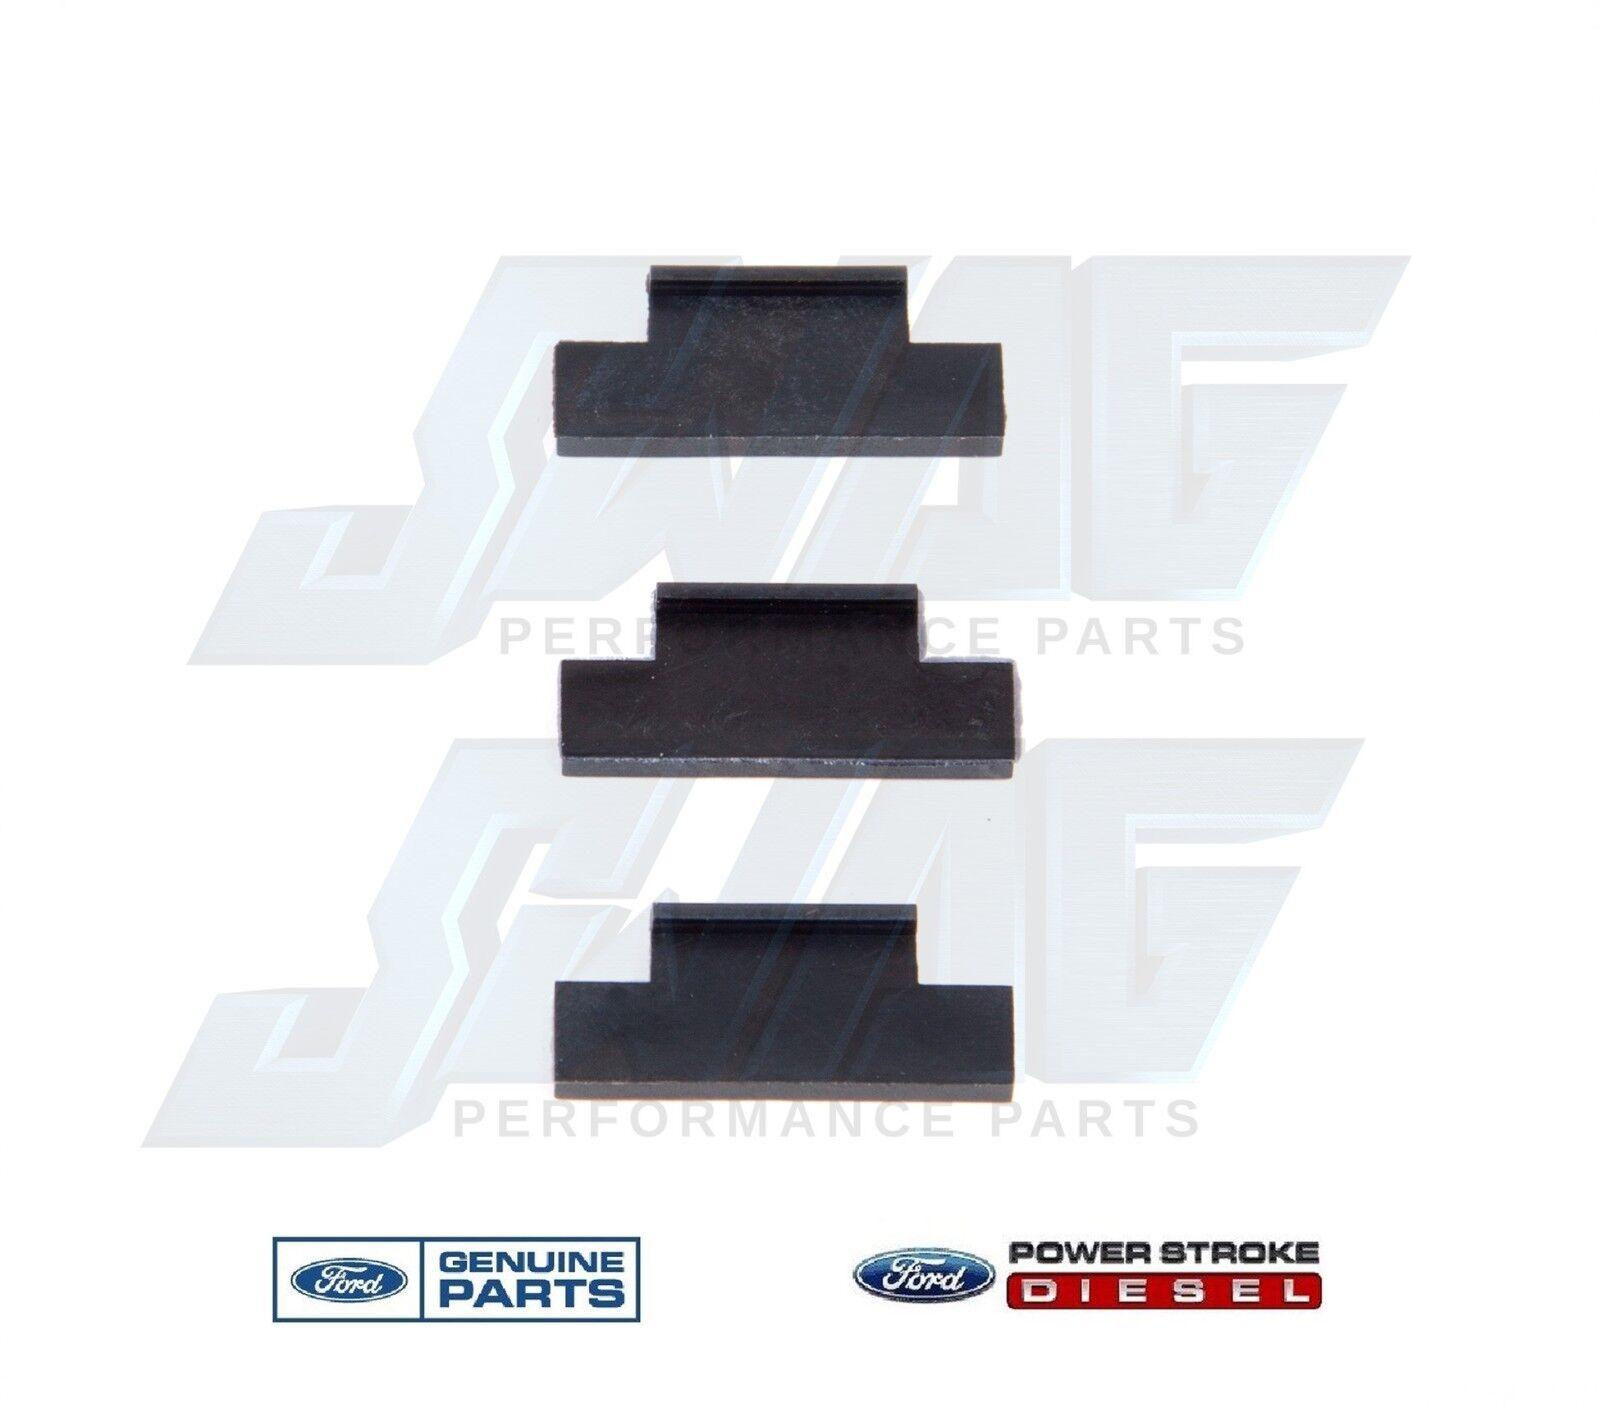 hight resolution of 99 03 7 3l powerstroke diesel genuine ford valve cover gasket retainer push lock